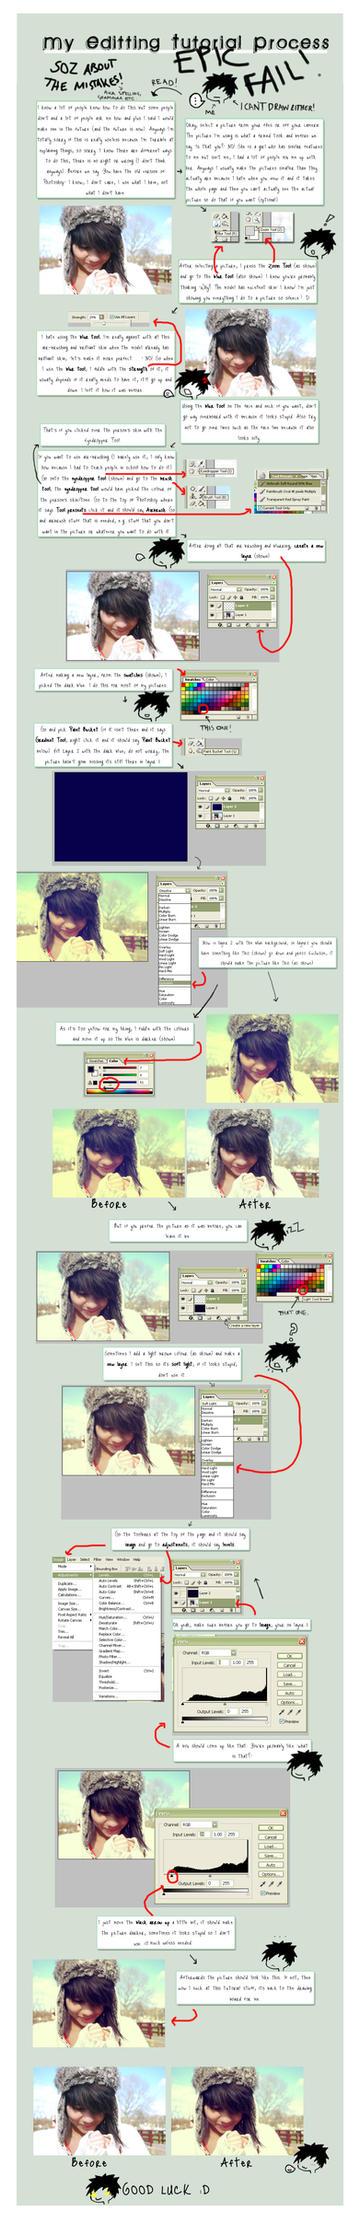 My Editing Tutorial Process. by RunWhiteRabbit